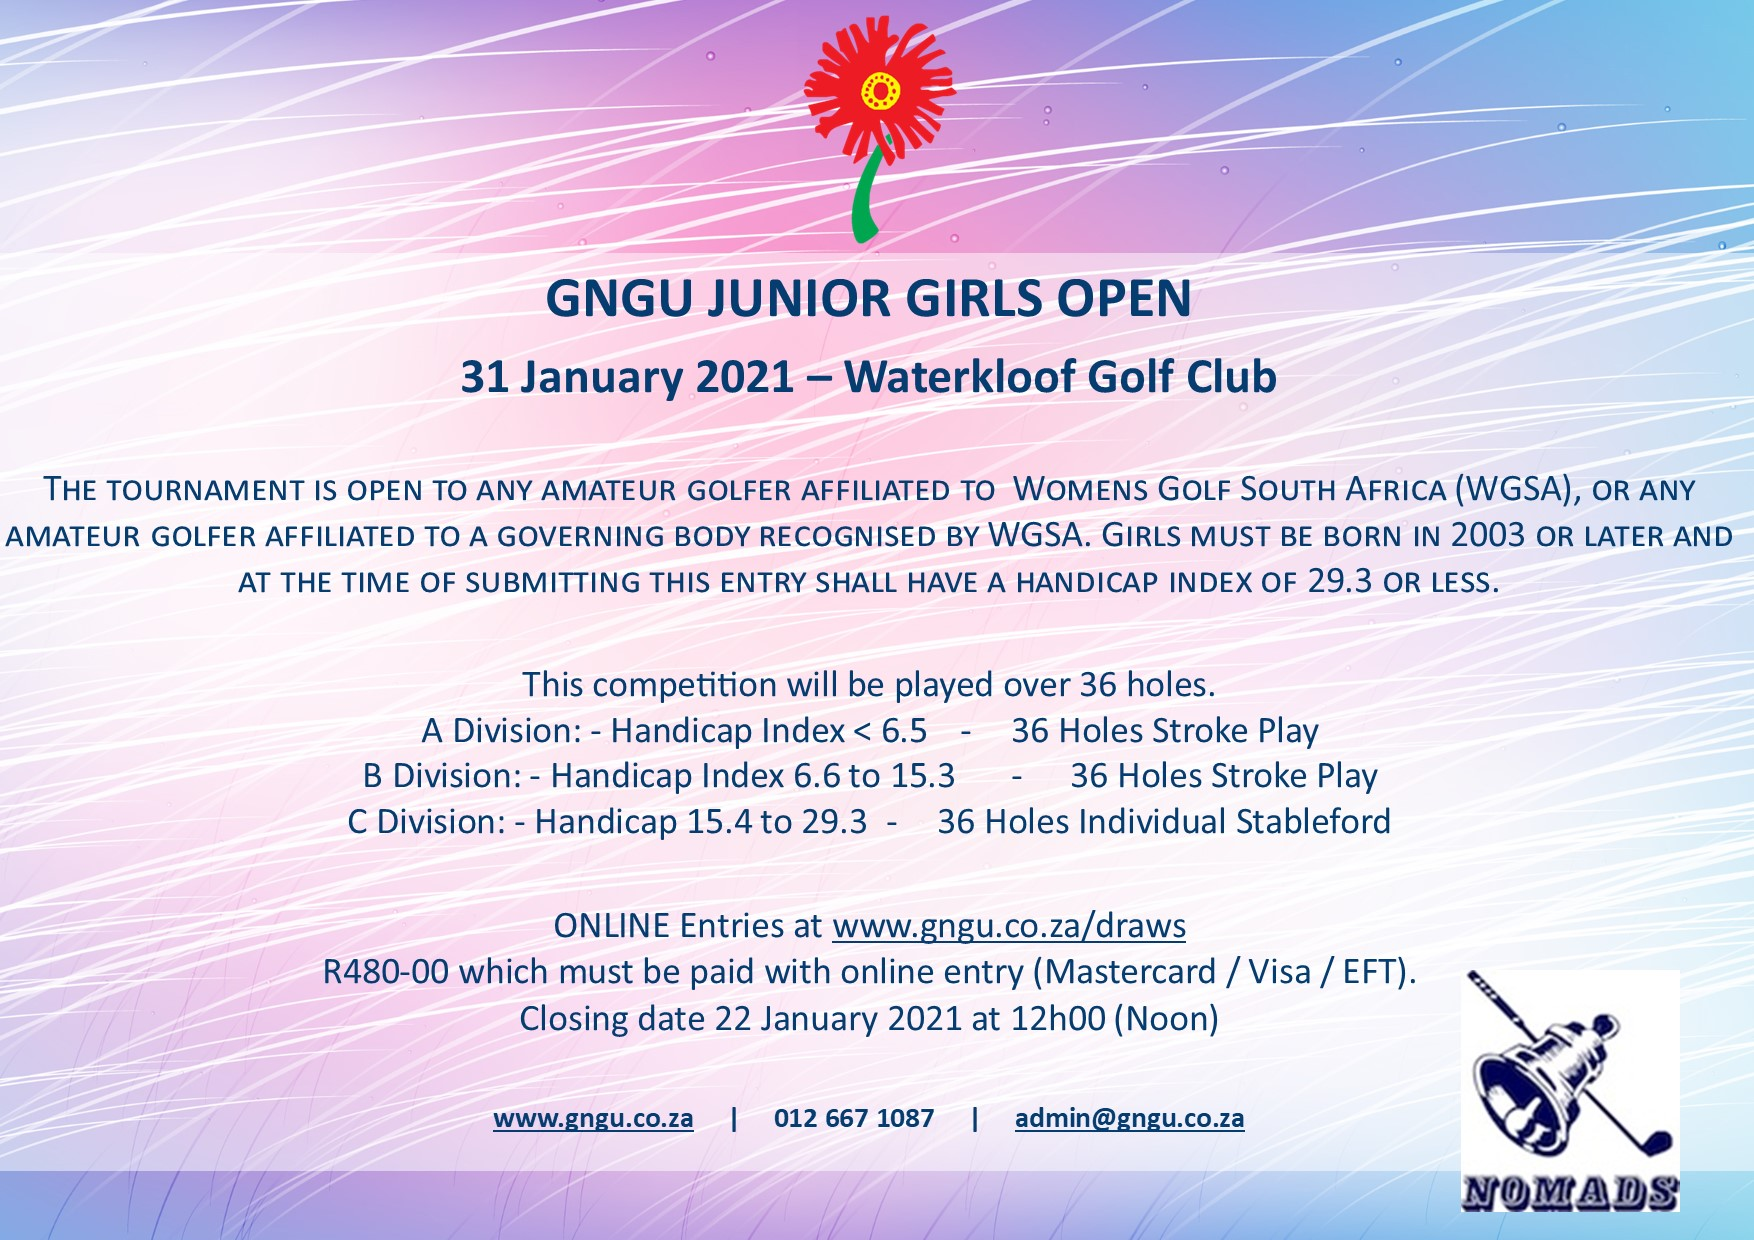 GNGU Junior Girls Open 2021